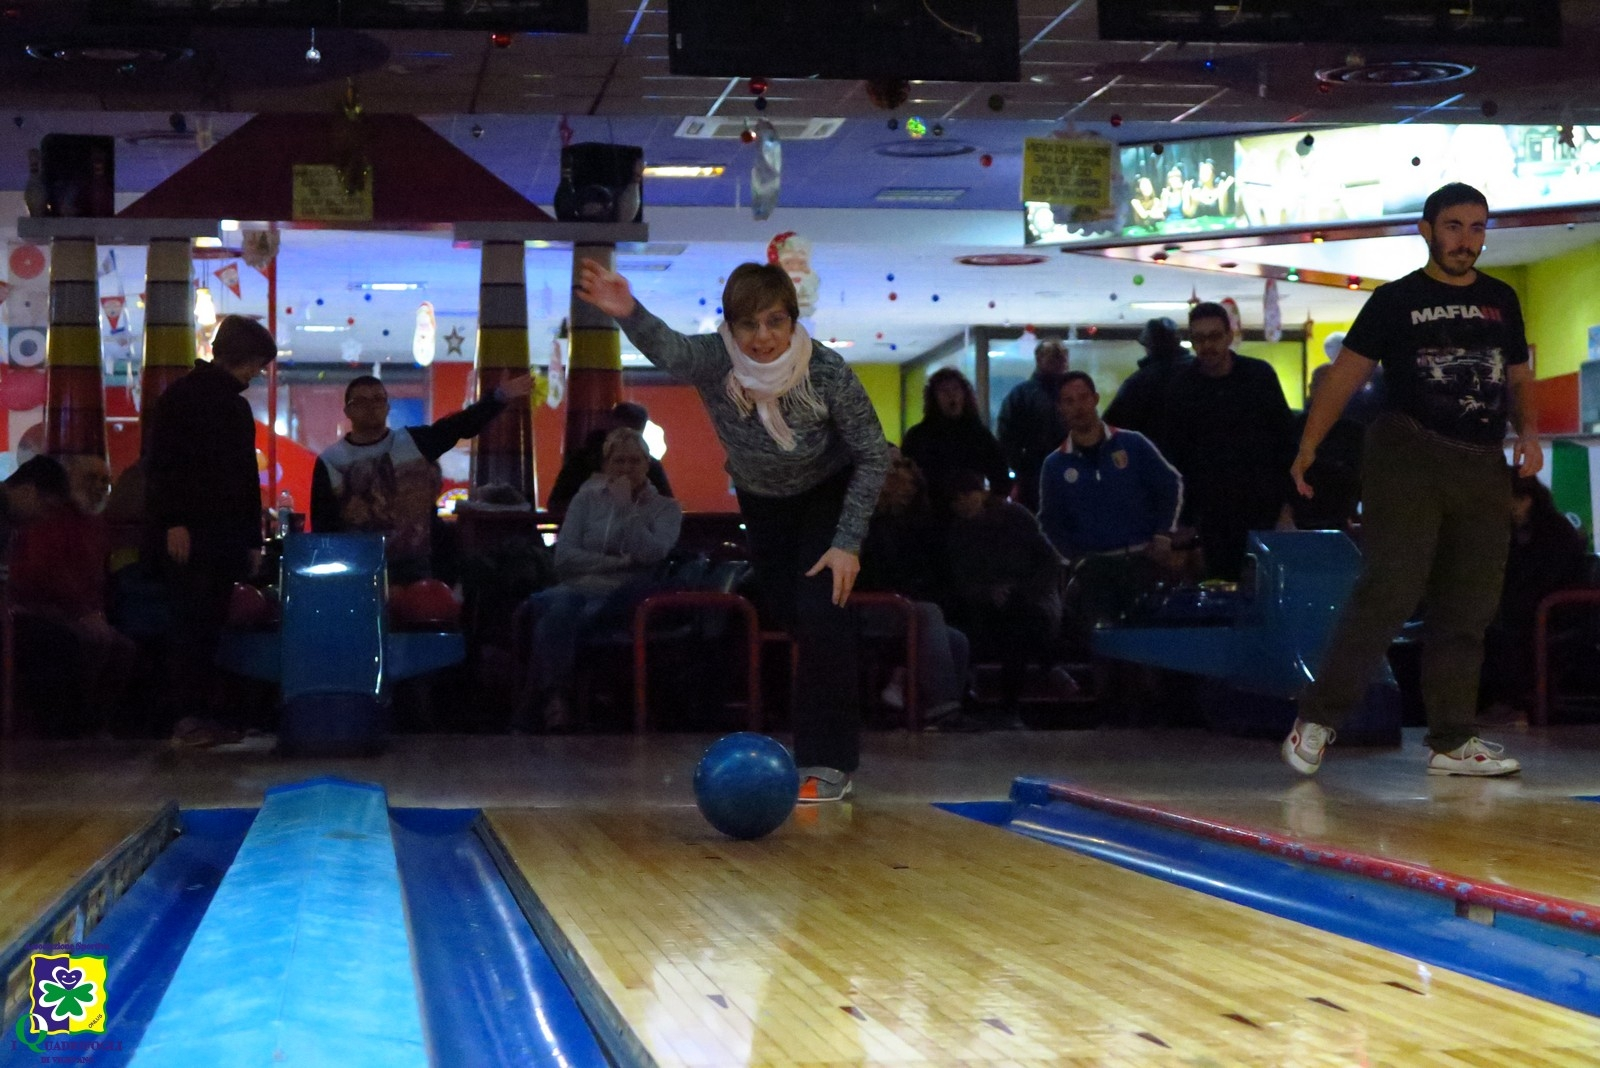 Torneo Bowling Vigevano 19-12-2018 - 030